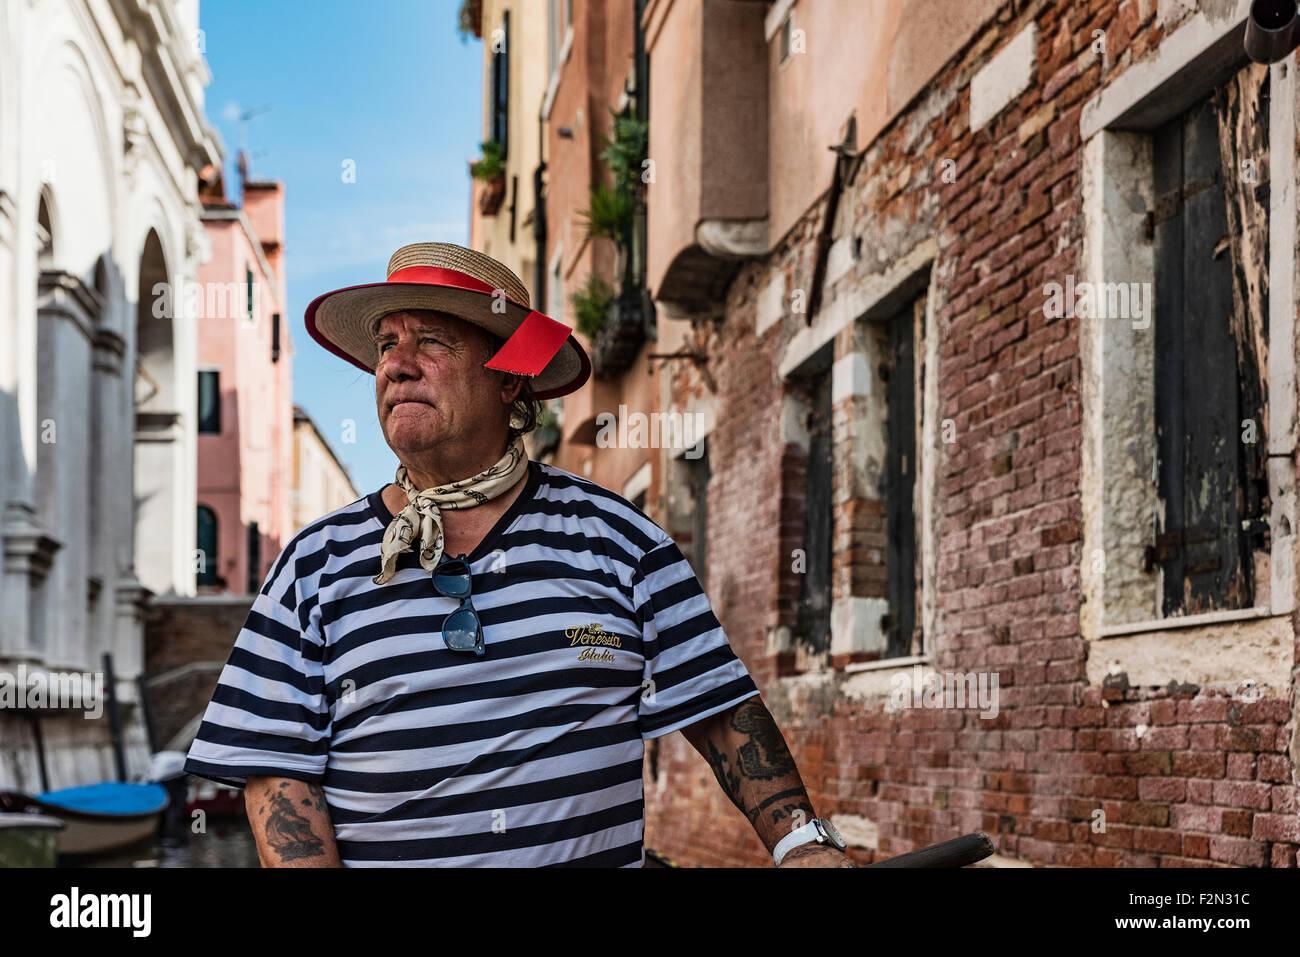 Portrait of a gondolier, Venice, Italy - Stock Image